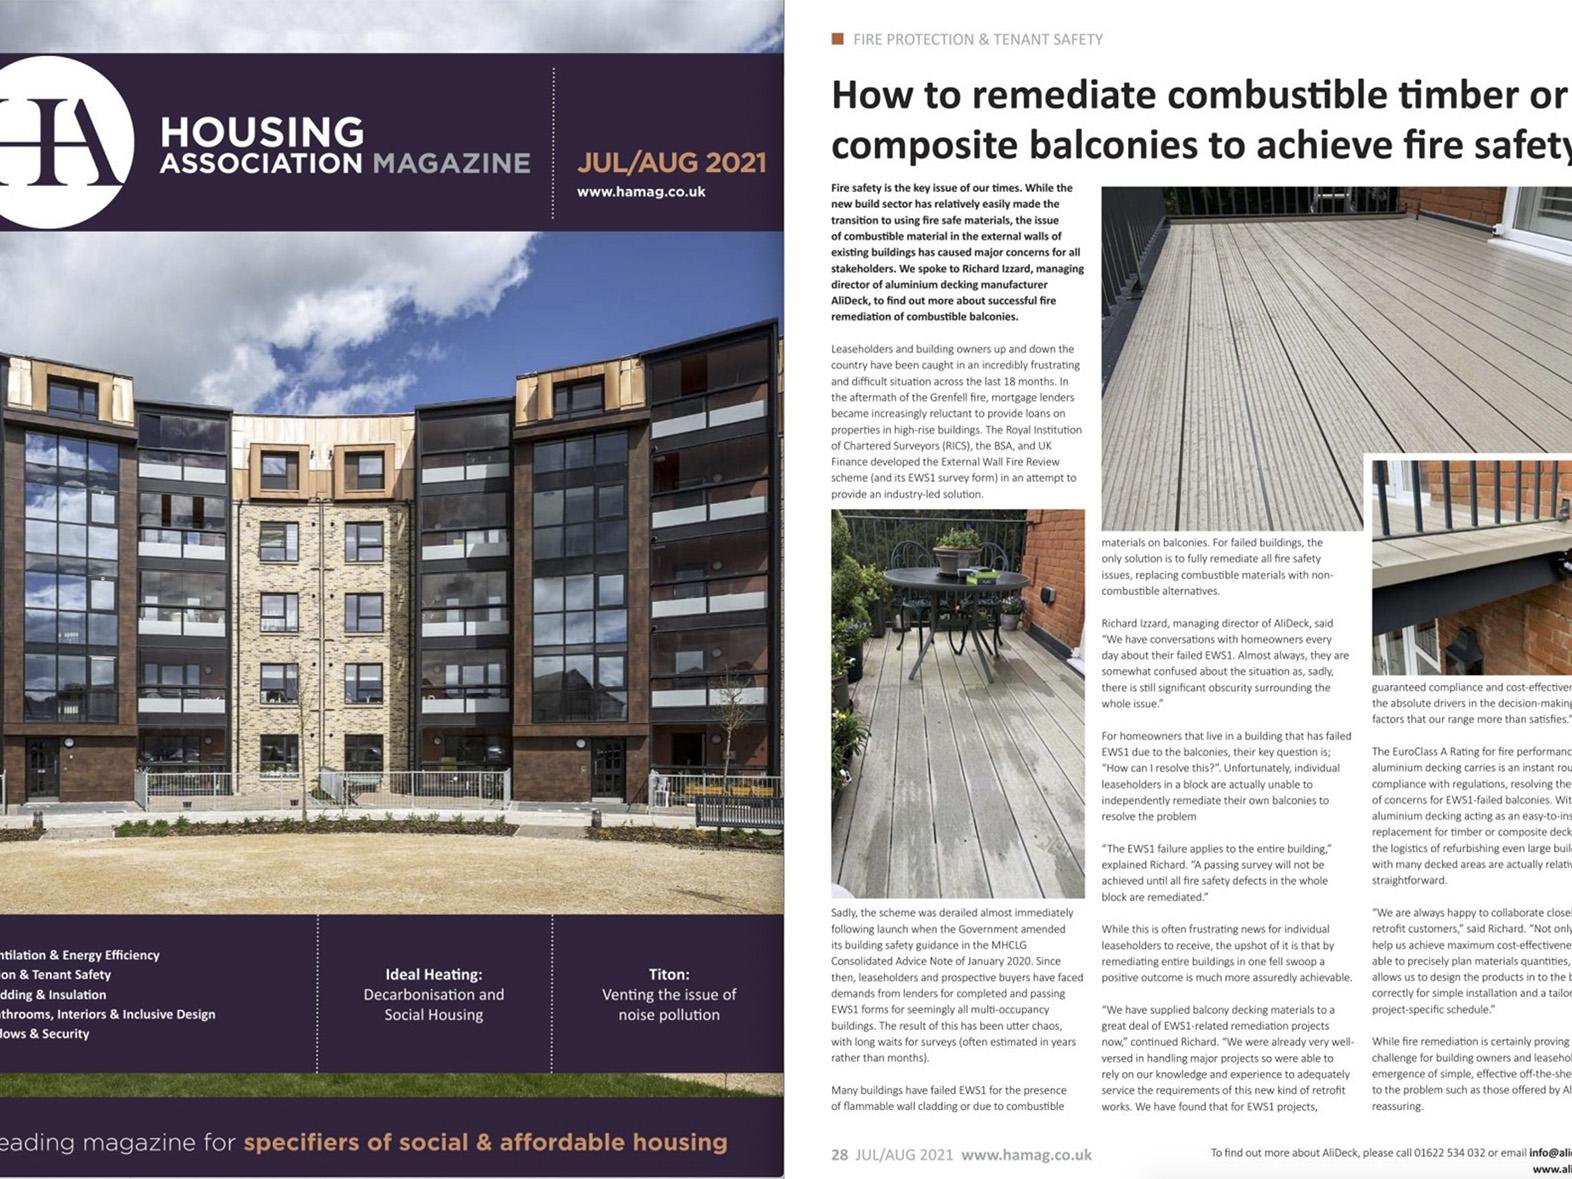 AliDeck Housing Association Magazine July August 2021